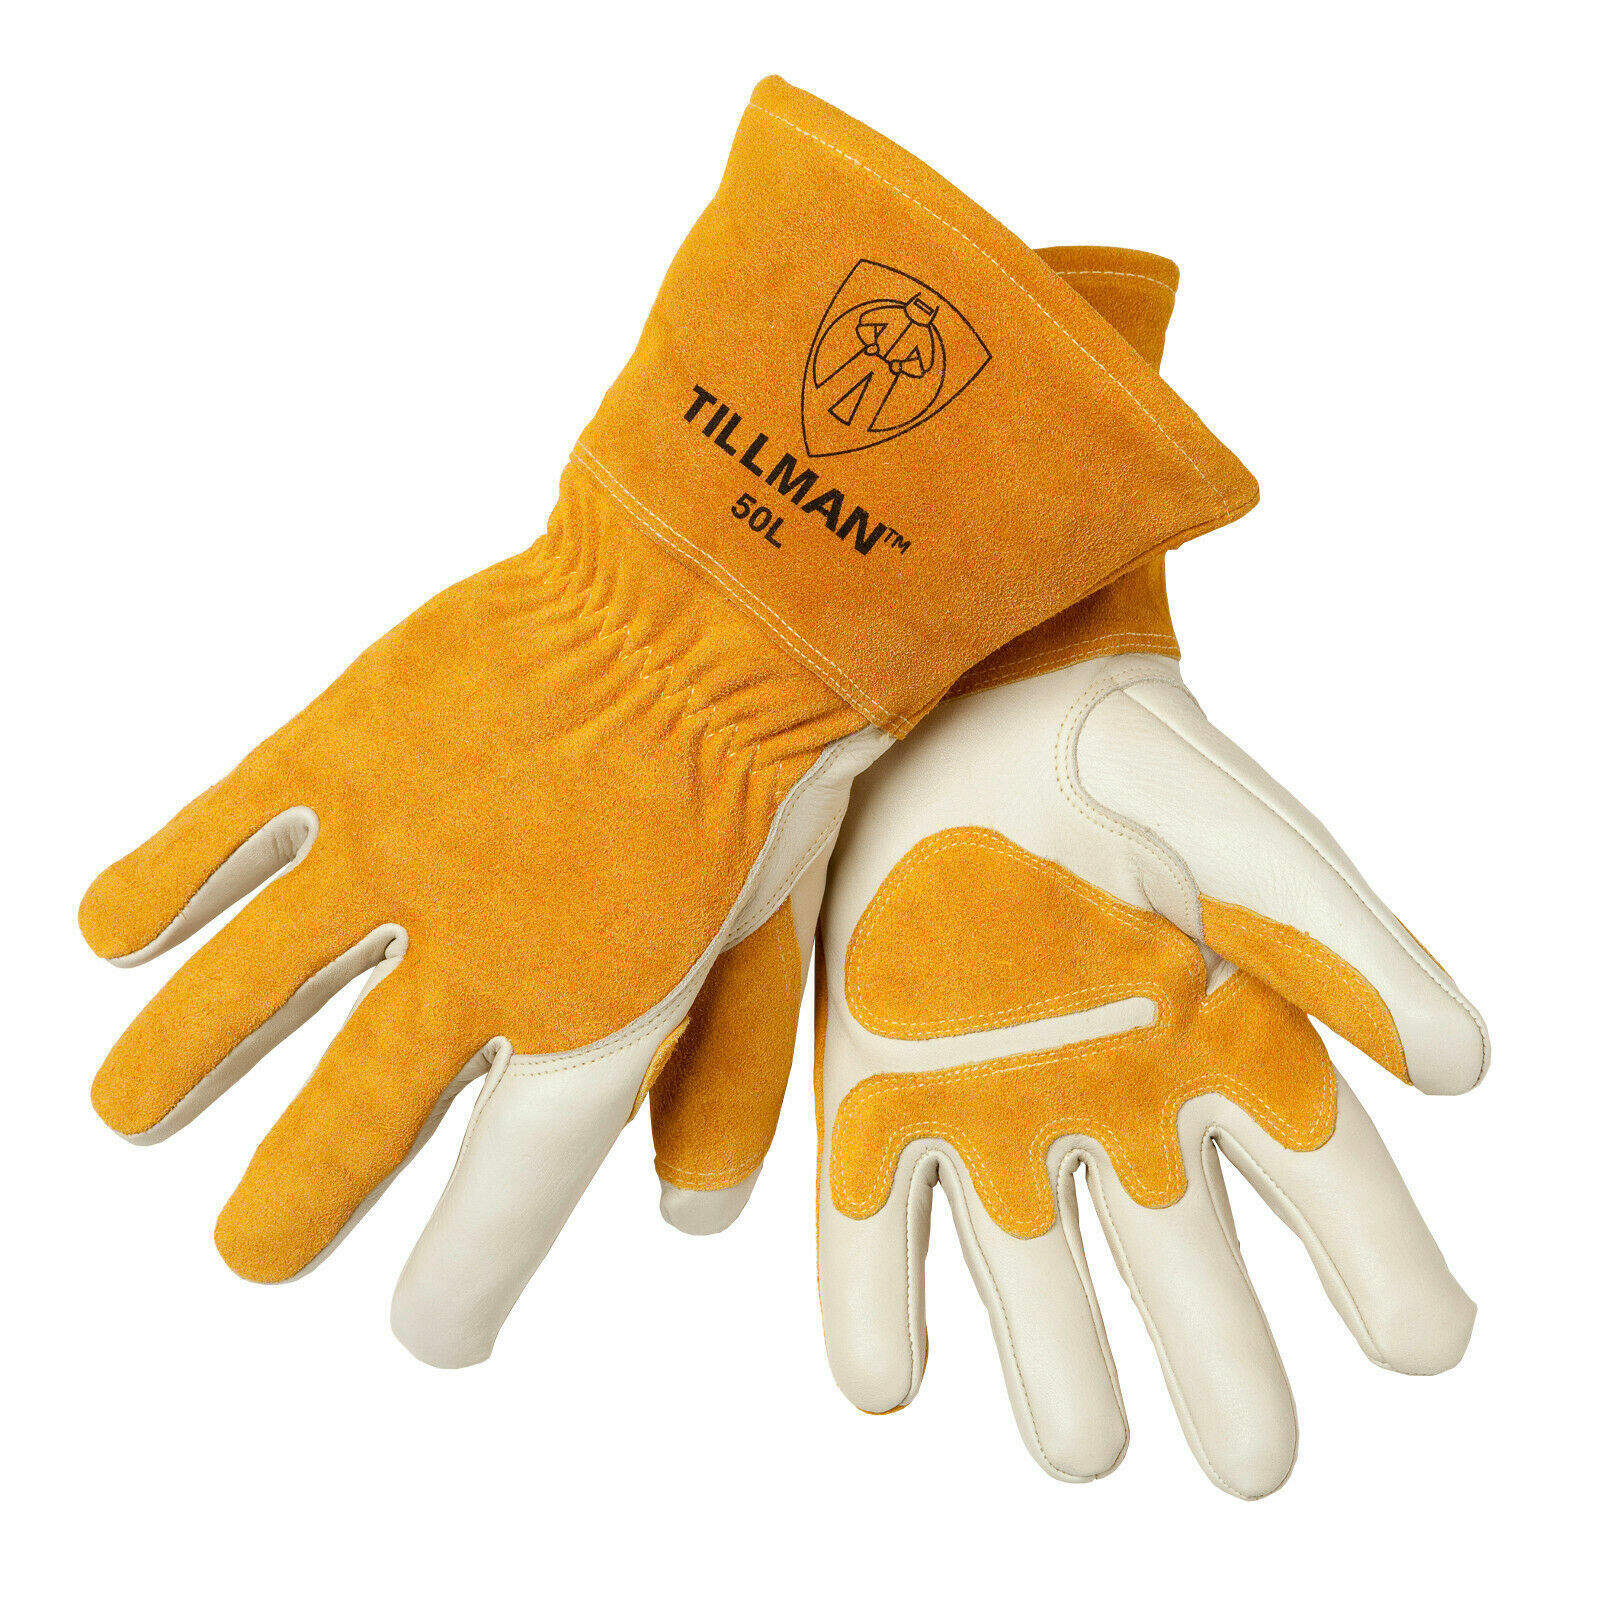 Tillman 50 Top Grain Split Cowhide Fleece Lined MIG Welding Gloves Sizes S-2XL Business & Industrial